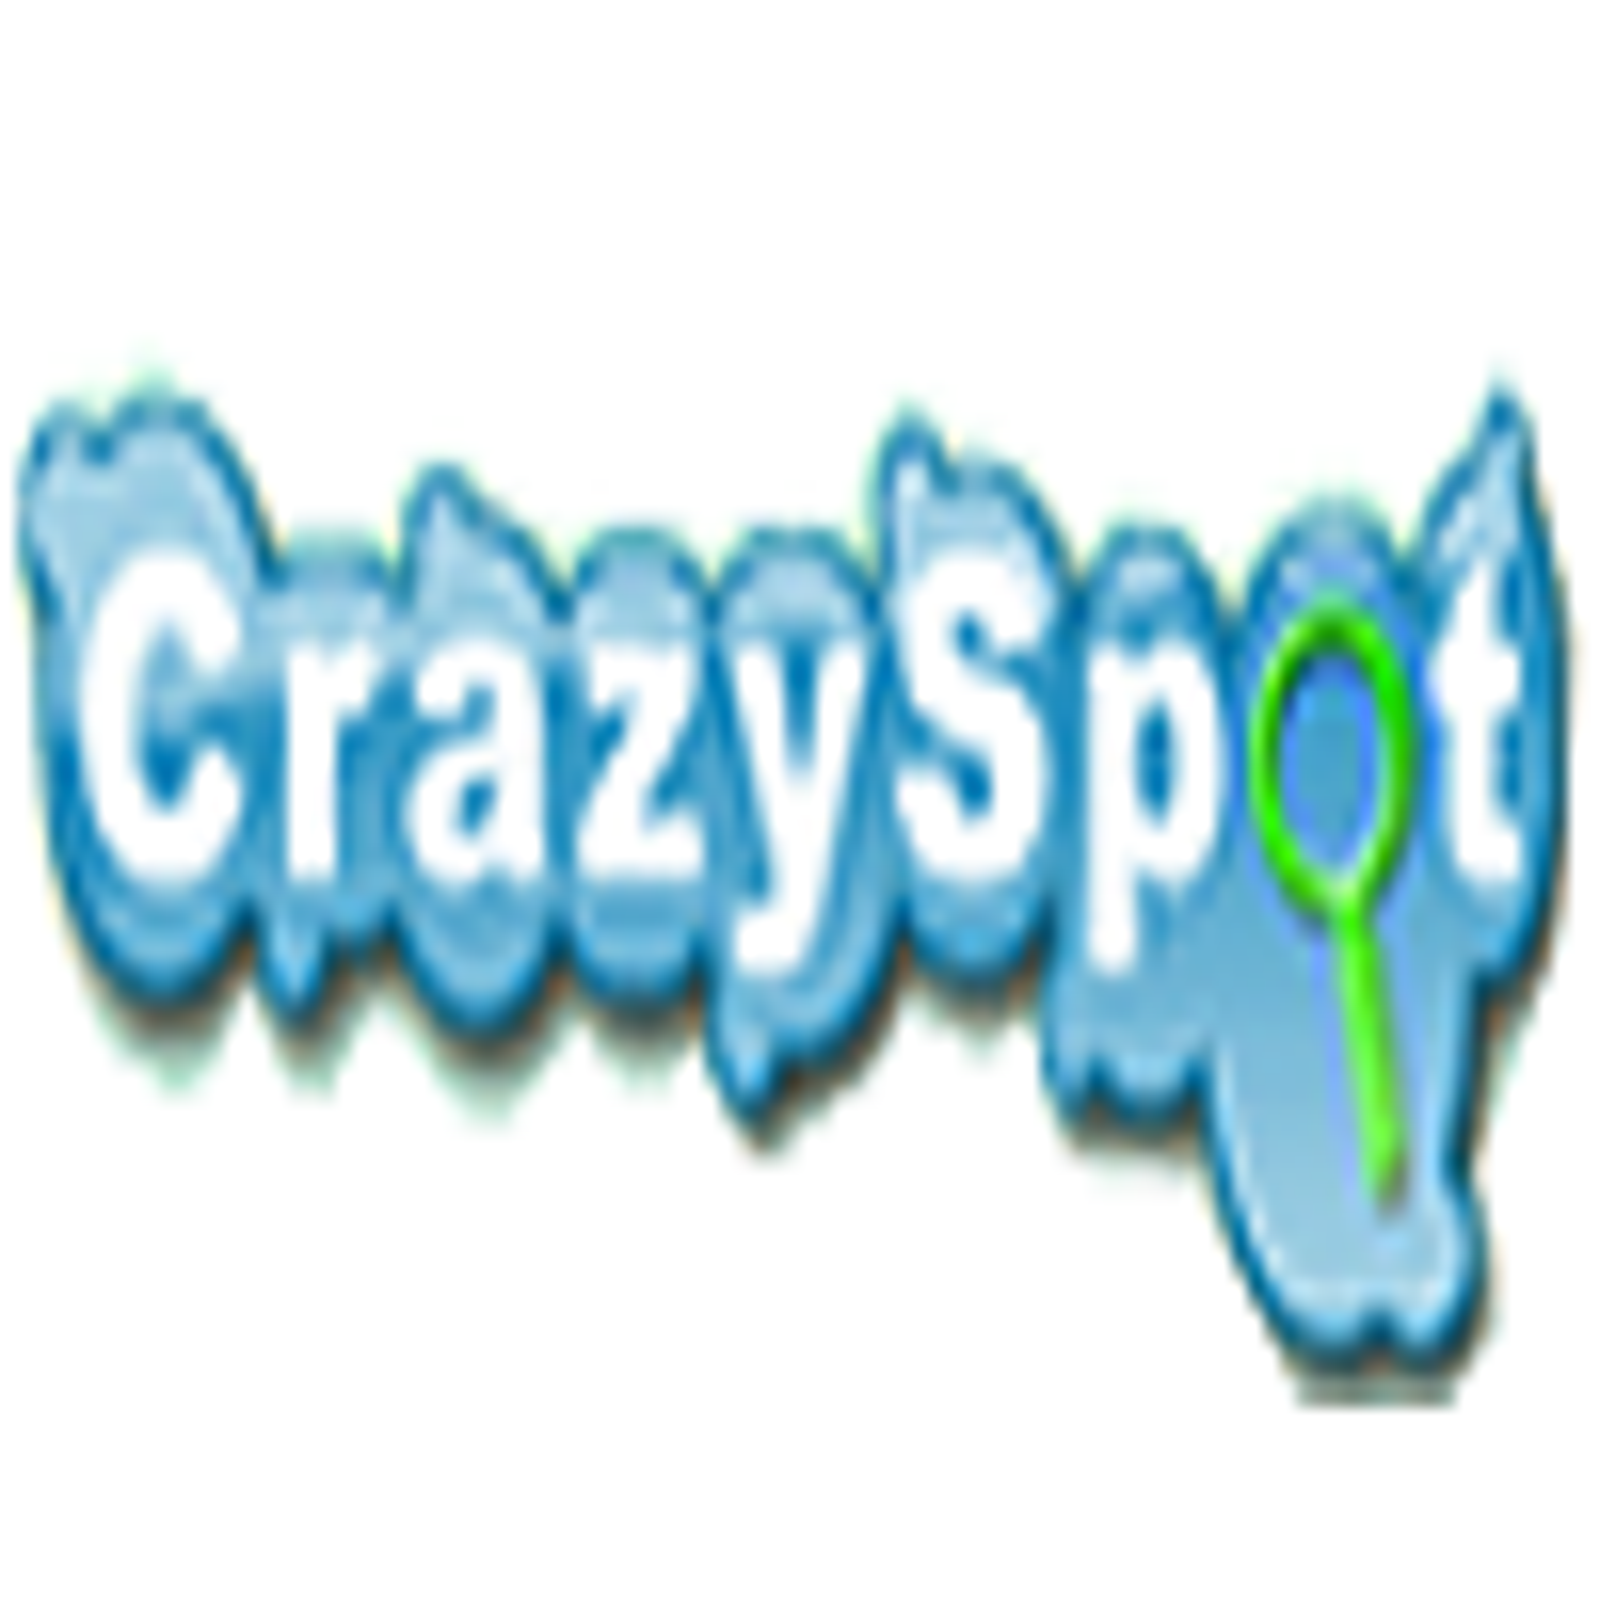 Crazy Spot 1.01